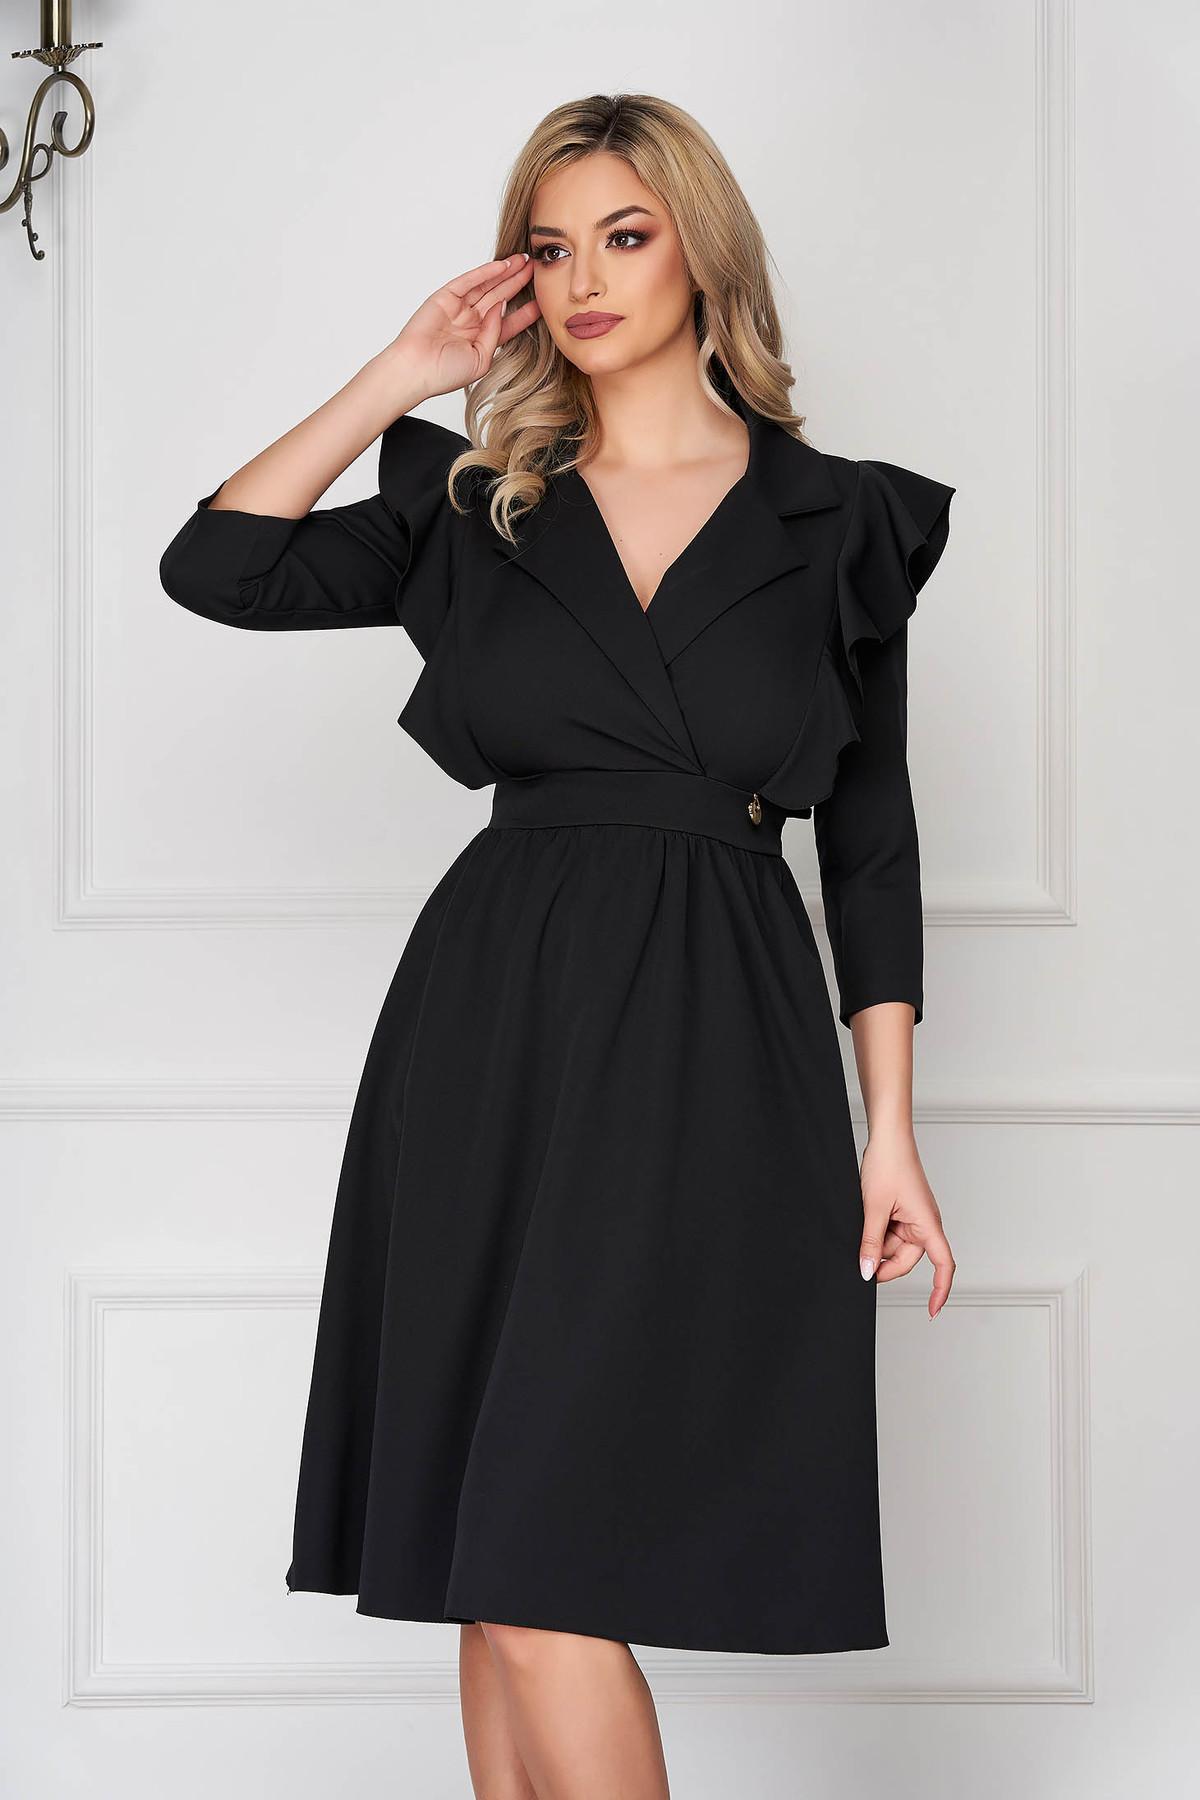 Rochie neagra eleganta midi in clos din stofa subtire cu volanase la maneca